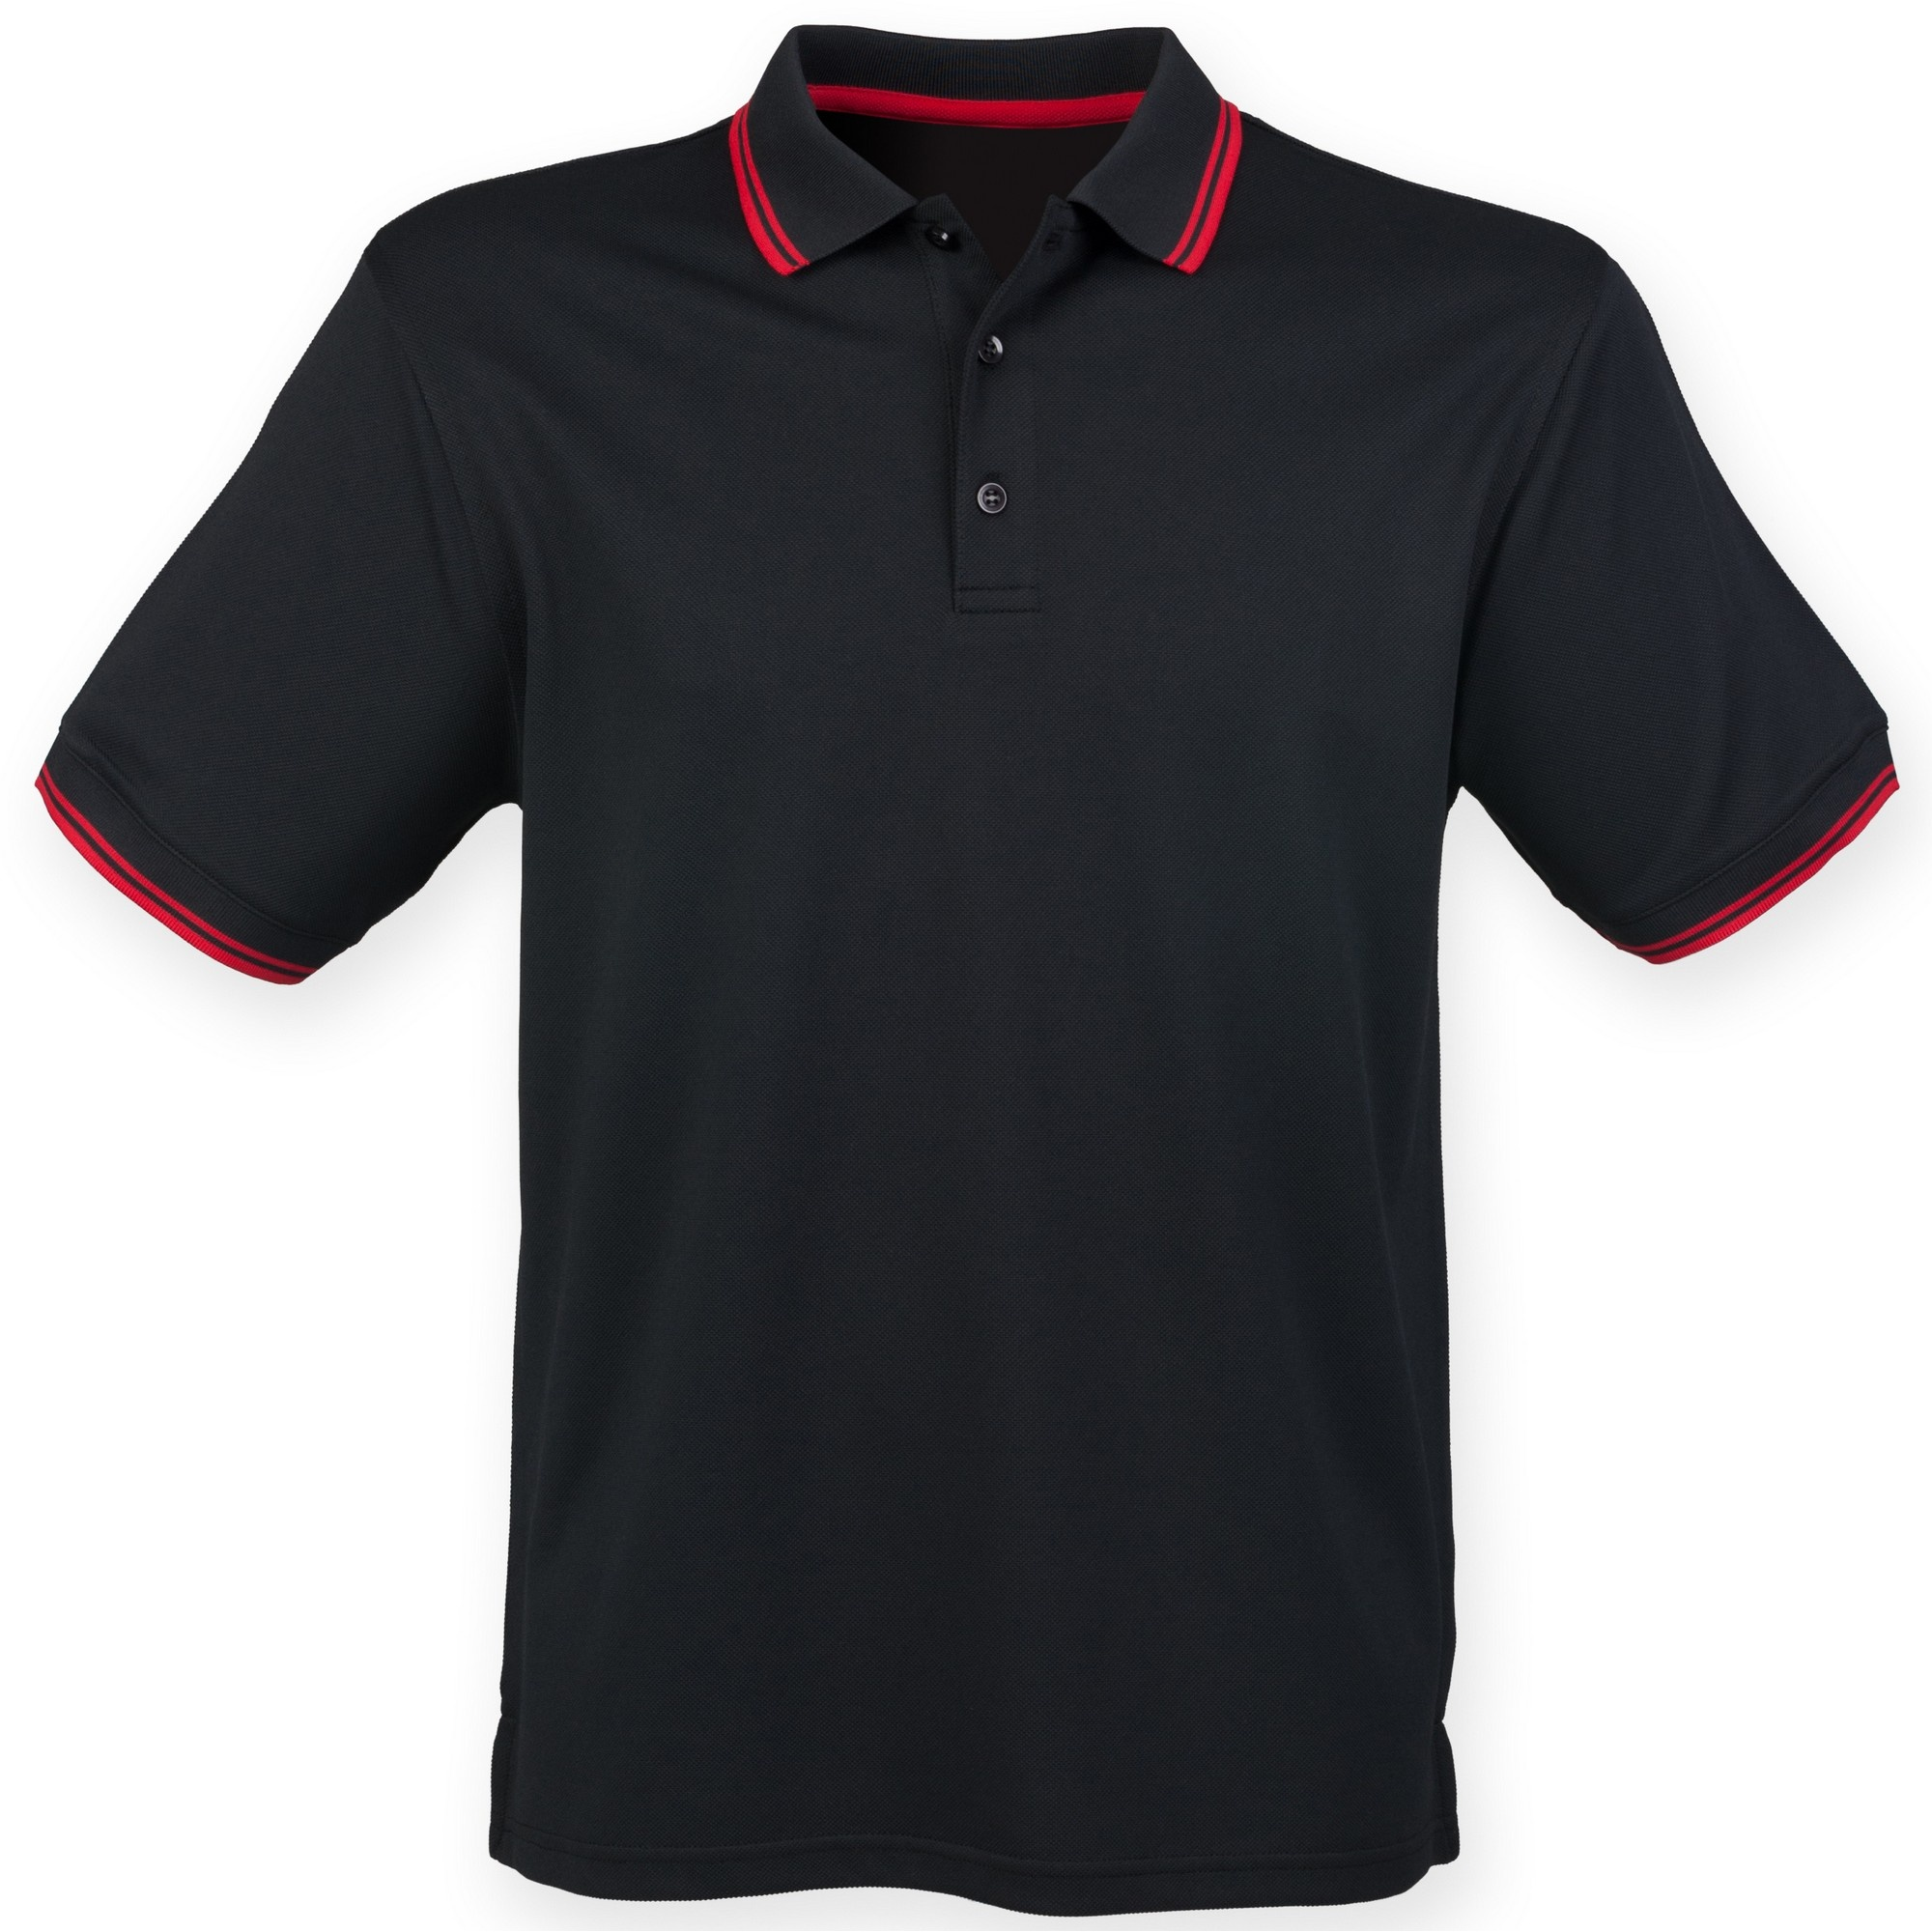 Henbury mens coolplus moisture wicking short sleeve polo shirt for Mens moisture wicking sleeveless shirts